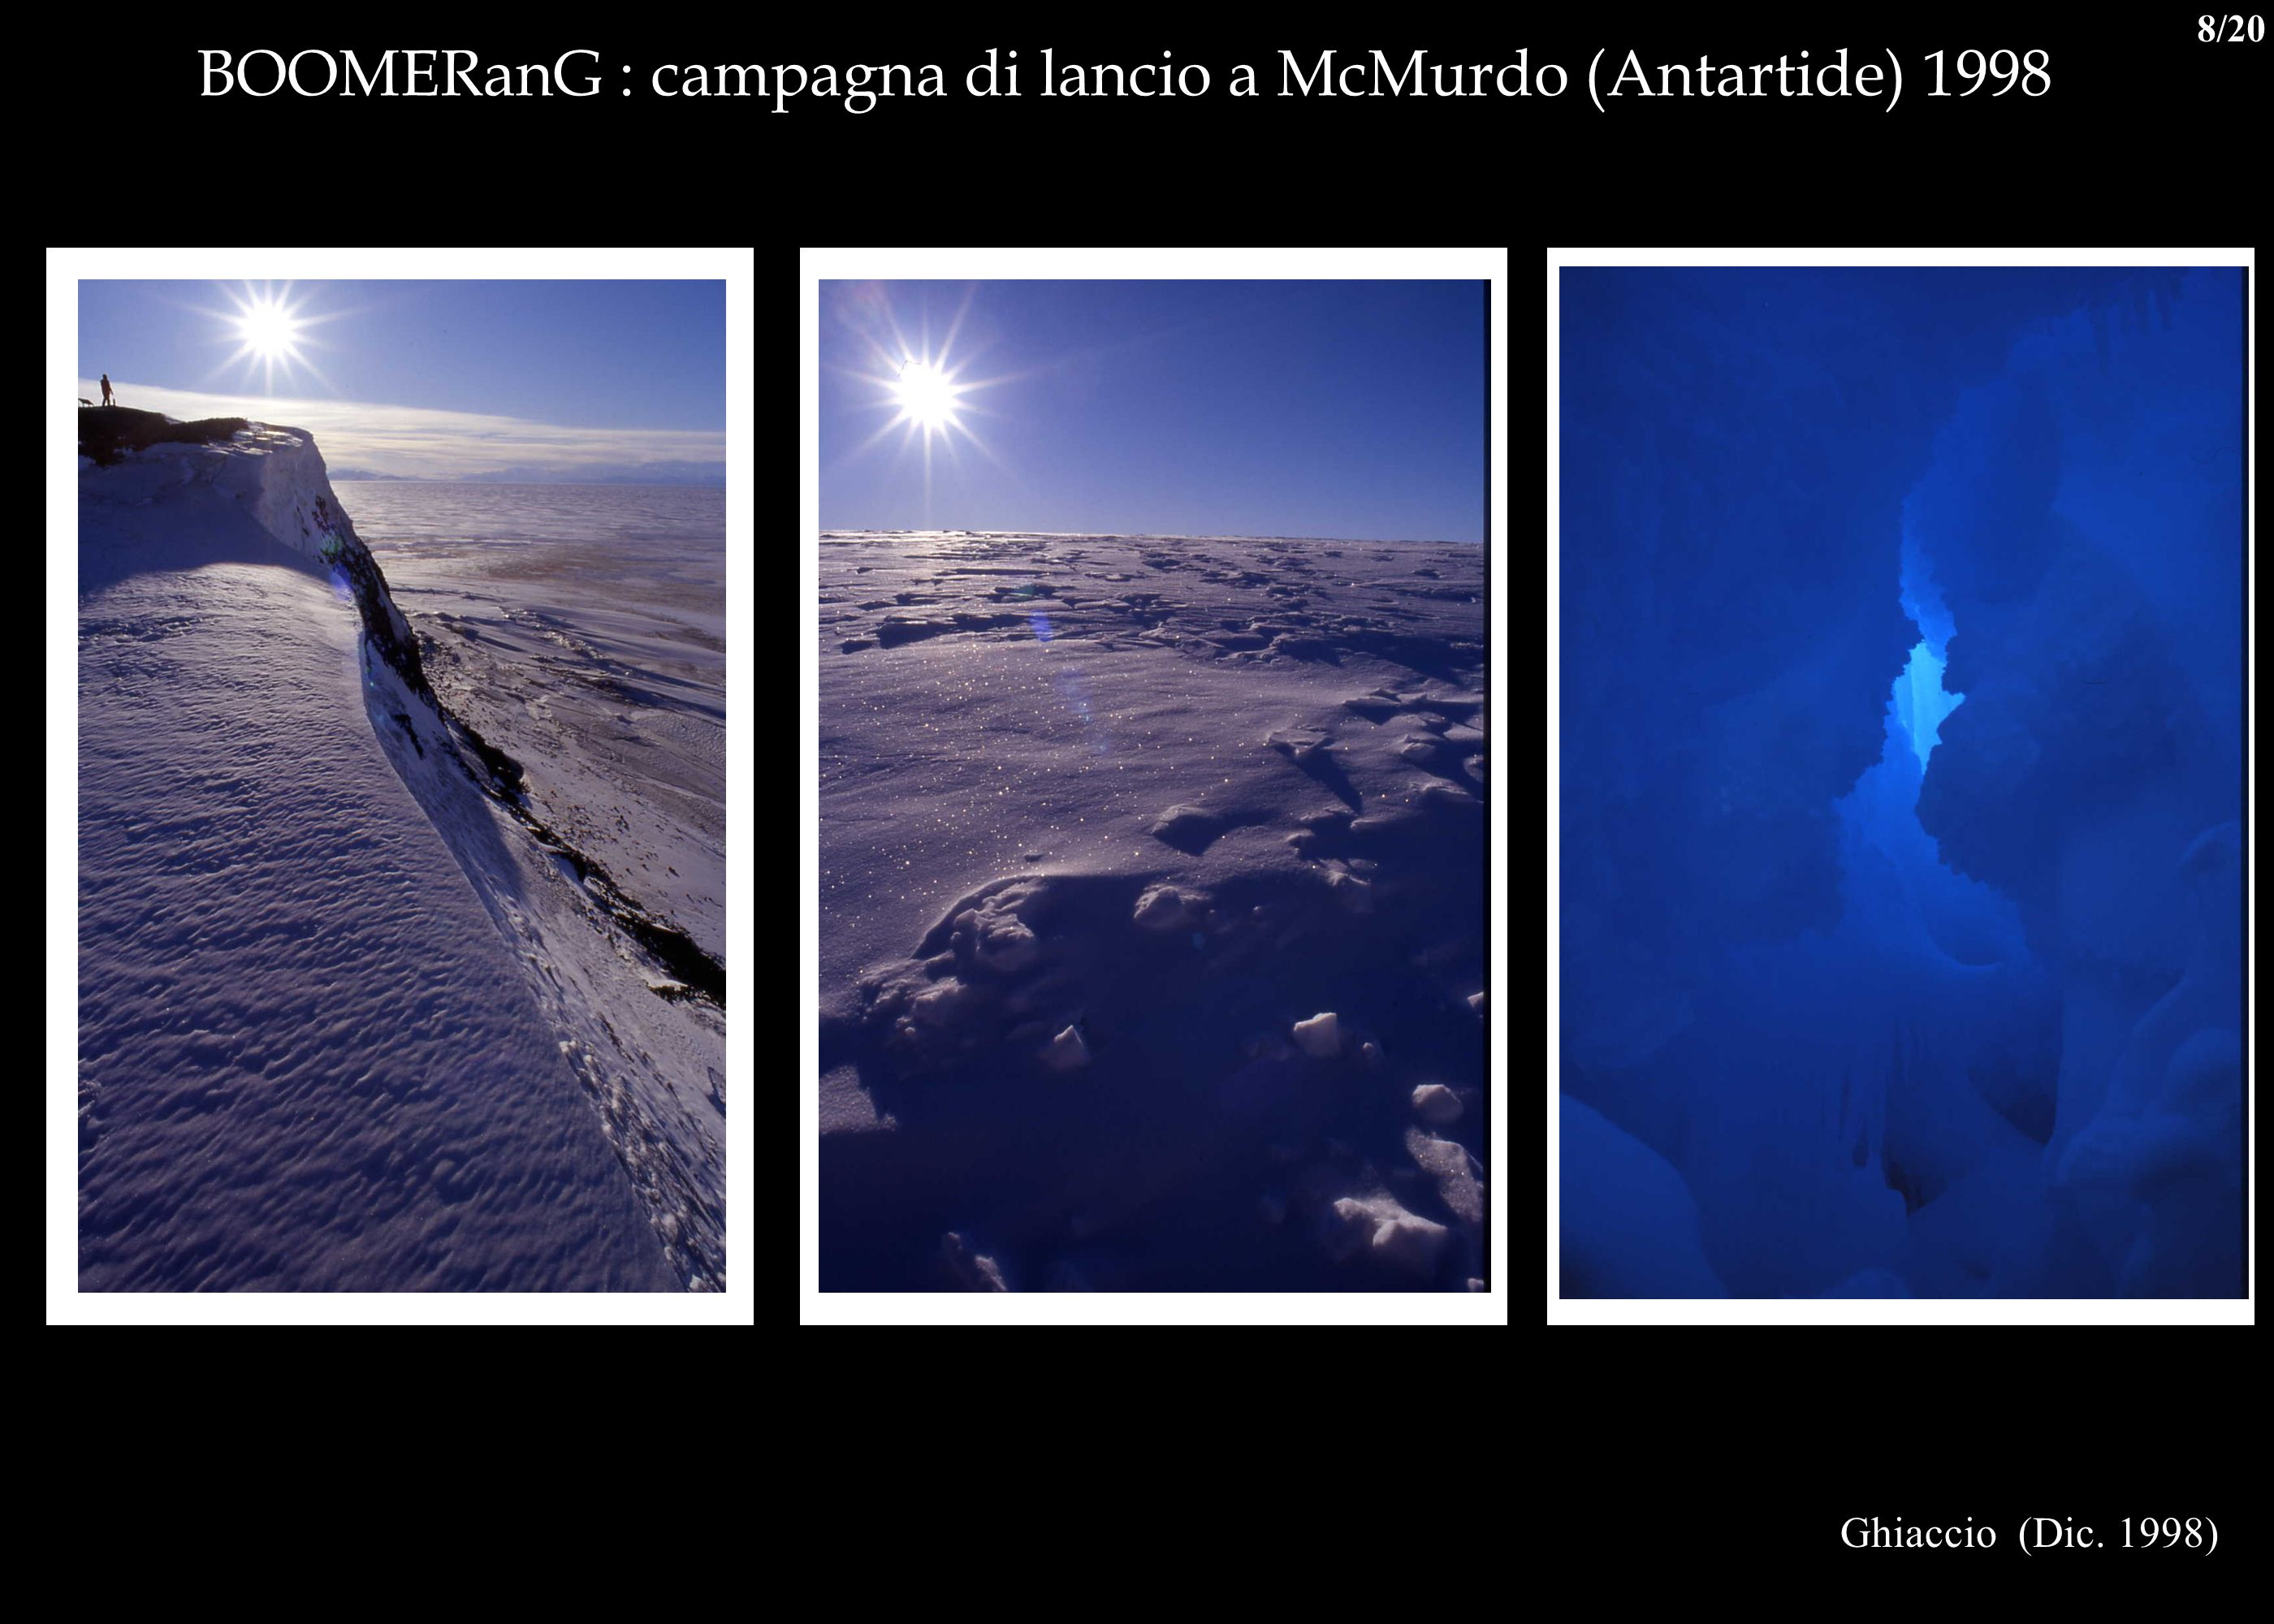 BOOMERanG : campagna di lancio a McMurdo (Antartide) 1998 Ghiaccio (Dic. 1998) 8/20